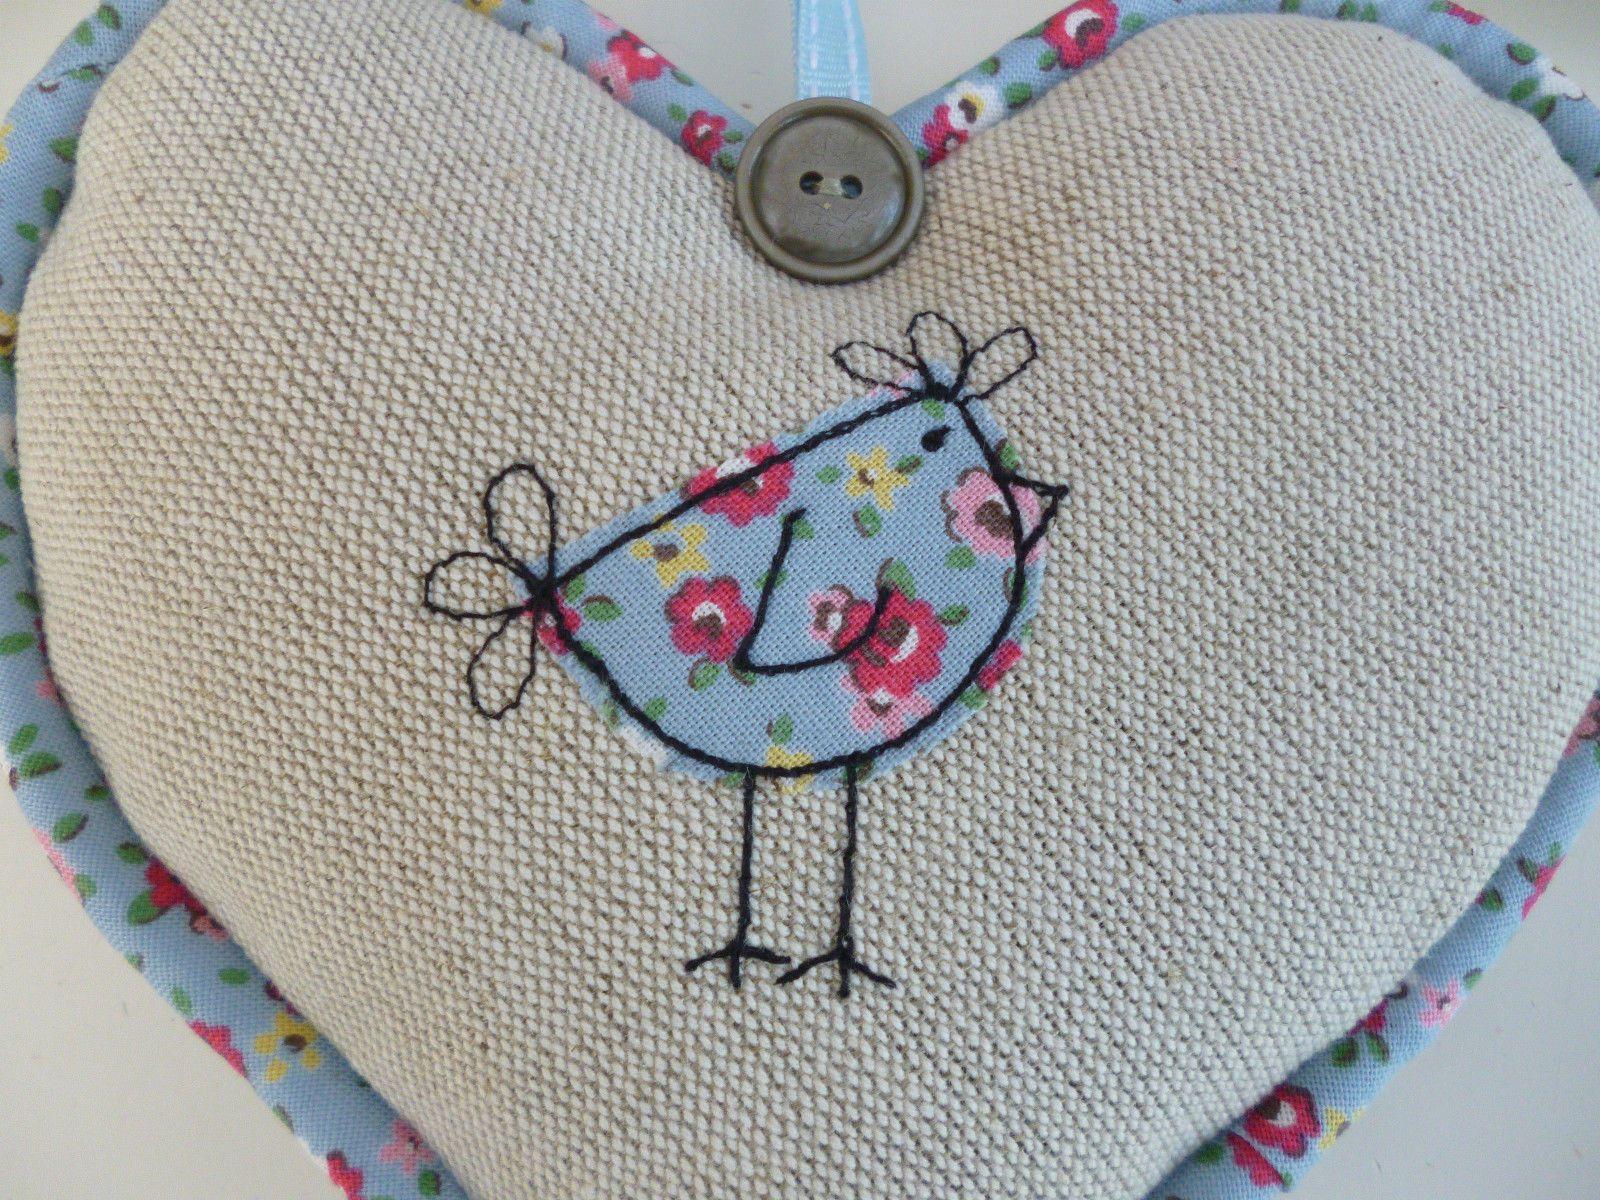 Handmade Lavender Hanging Heart, Cath Kidston Blue Floral Fabric, hen applique | eBay